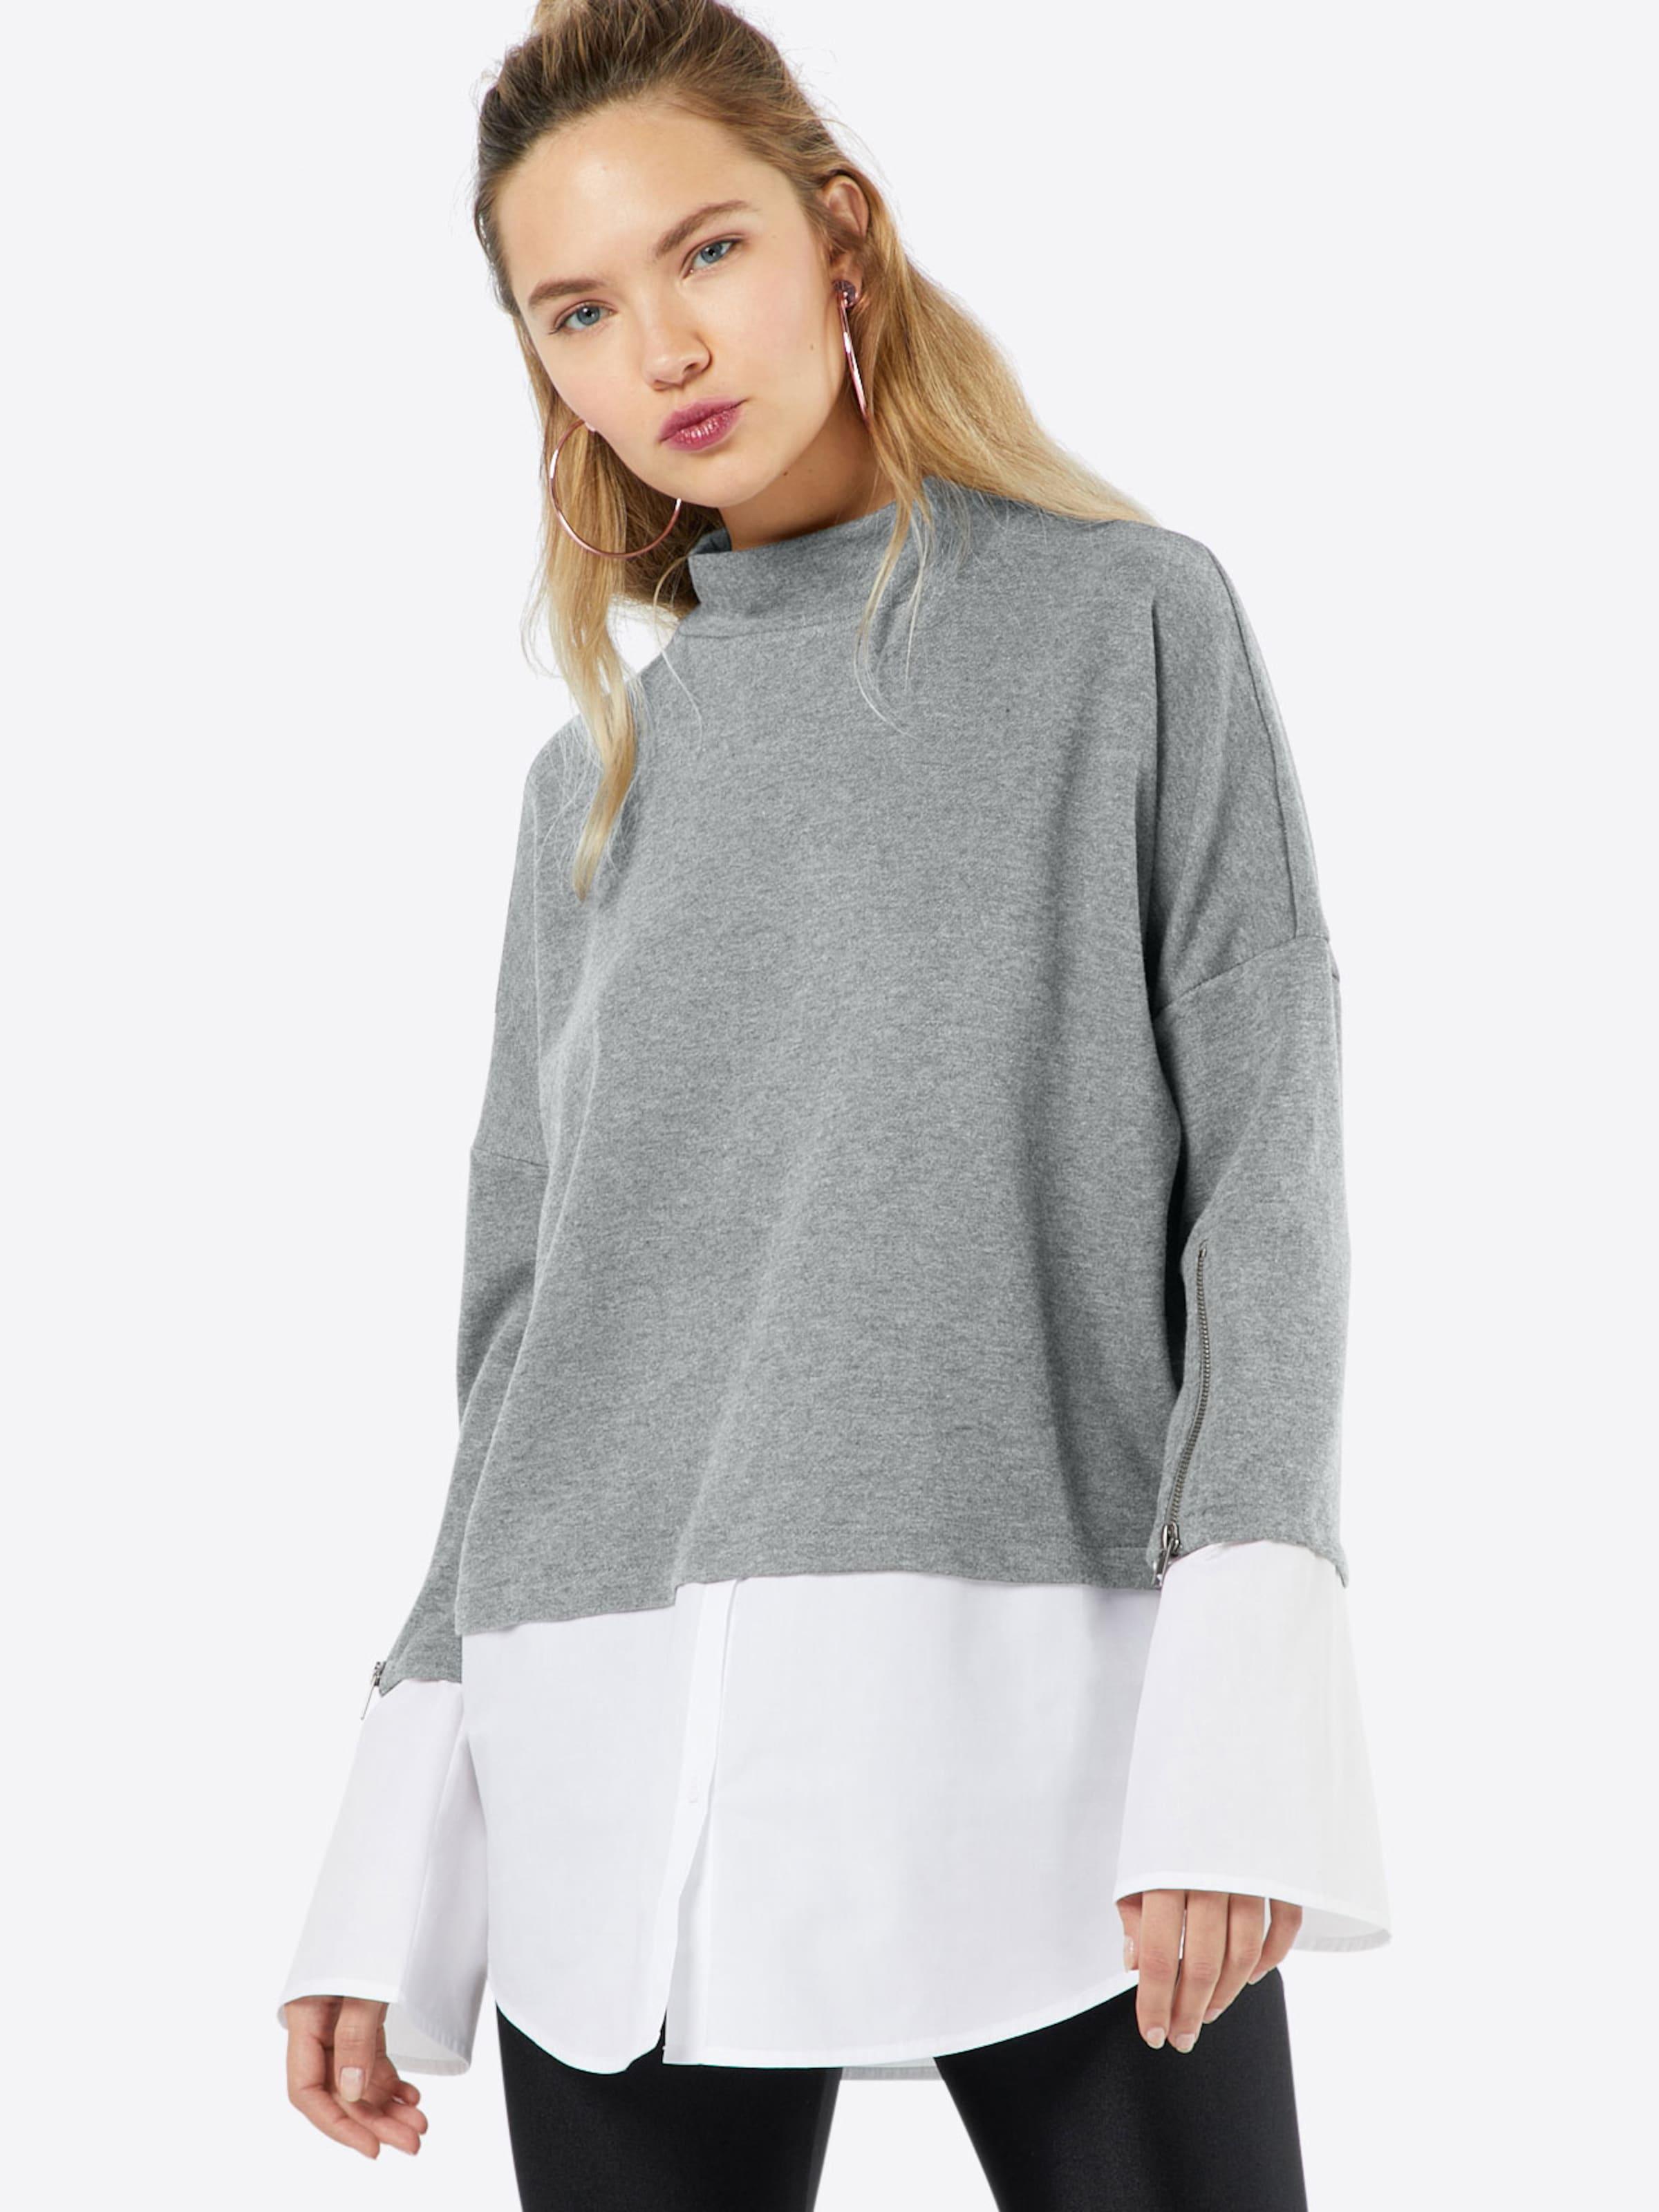 Noisy may Sweatshirt im Layering-Look 'Saga' 2018 Auslaß Freies Verschiffen Ebay cdAeuO